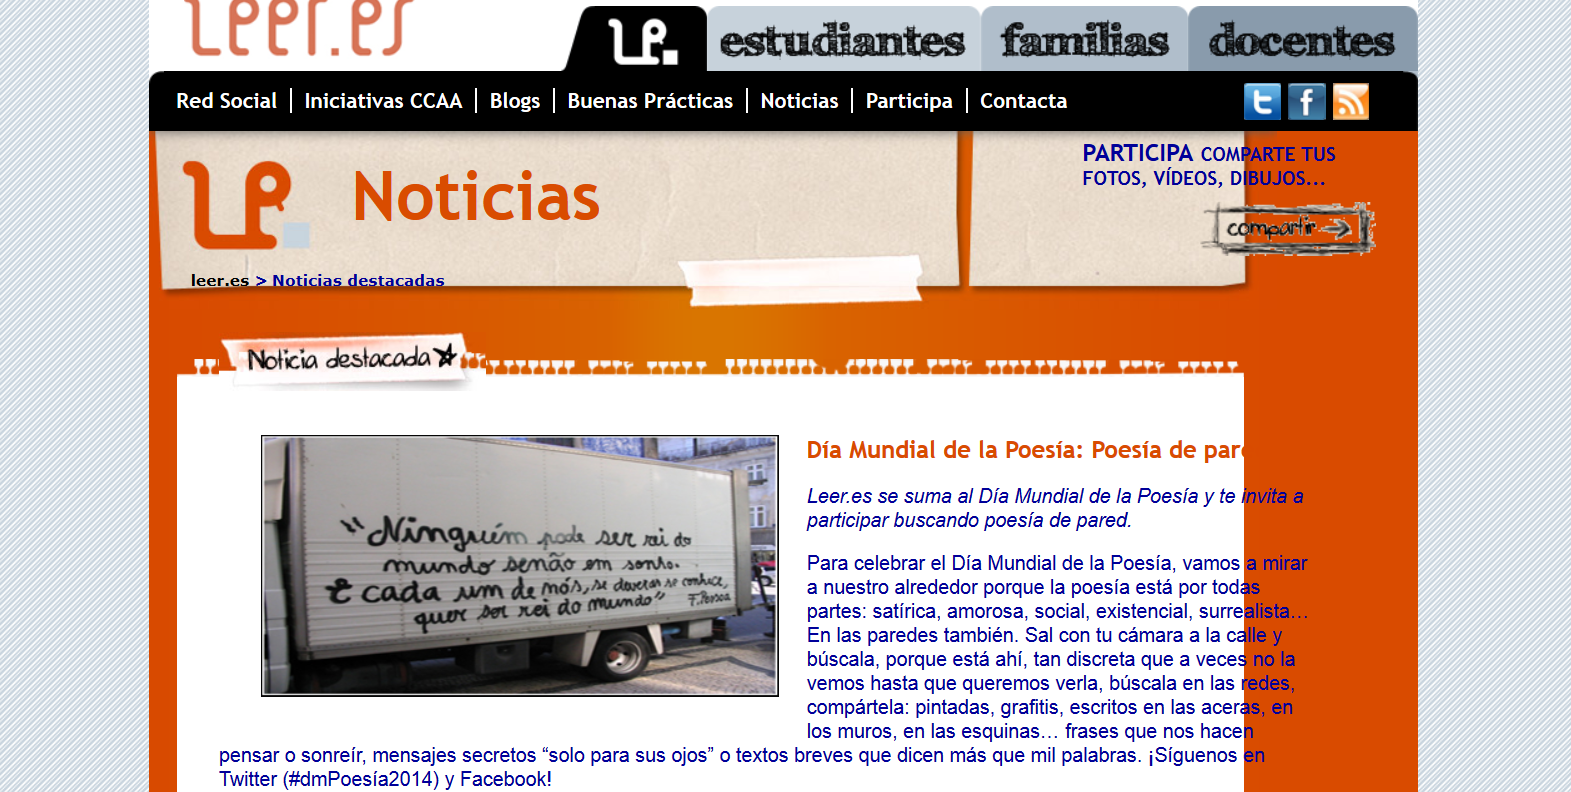 http://leer.es/dia-mundial-de-la-poesia-poesia-de-pared/